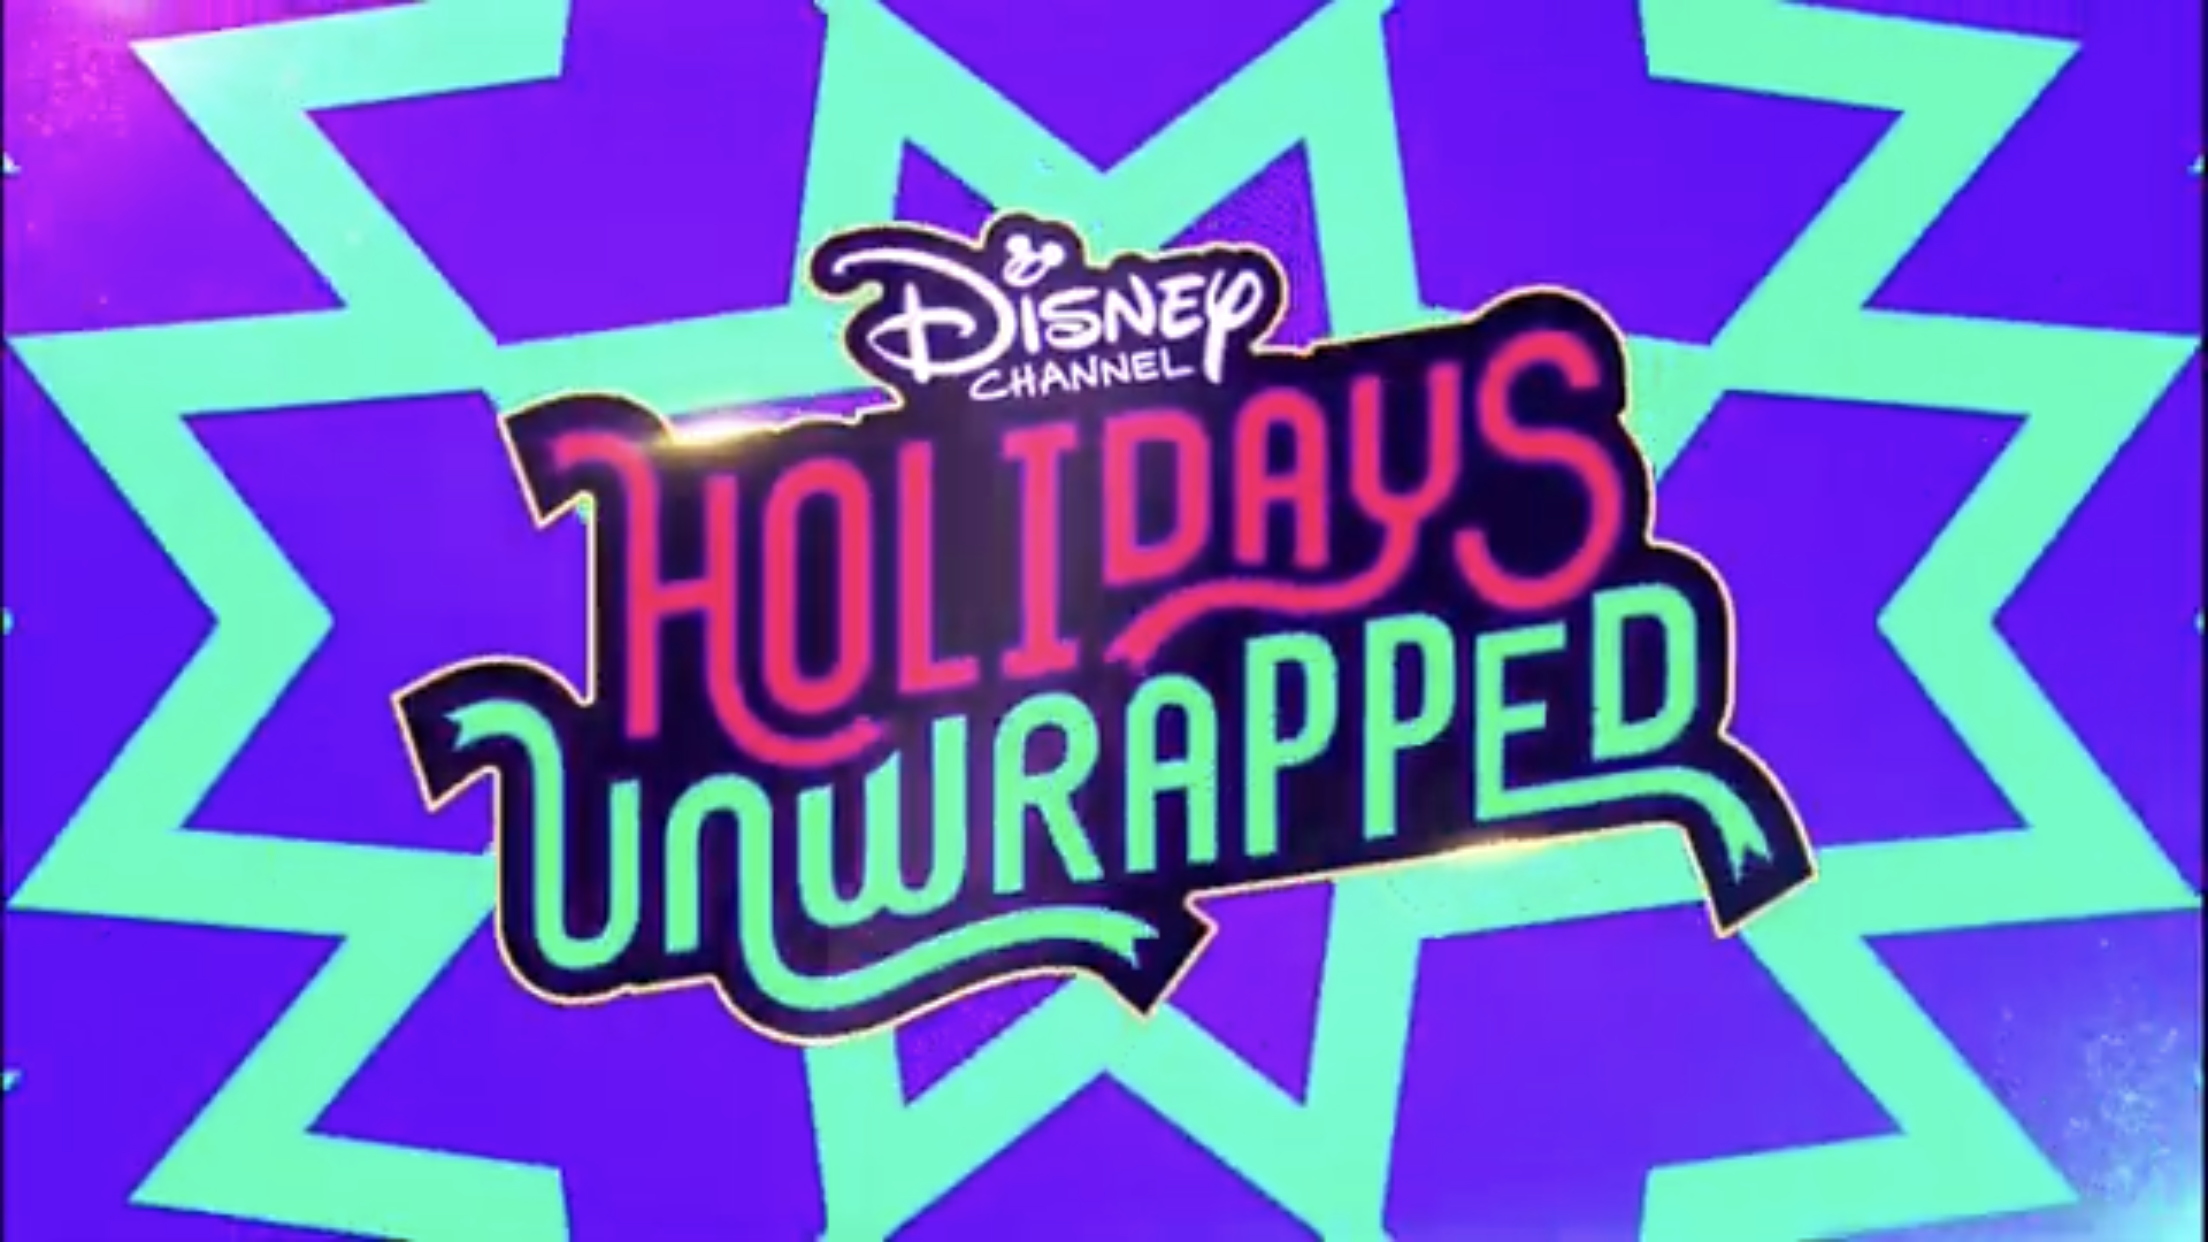 Holidays Unwrapped (programming block)